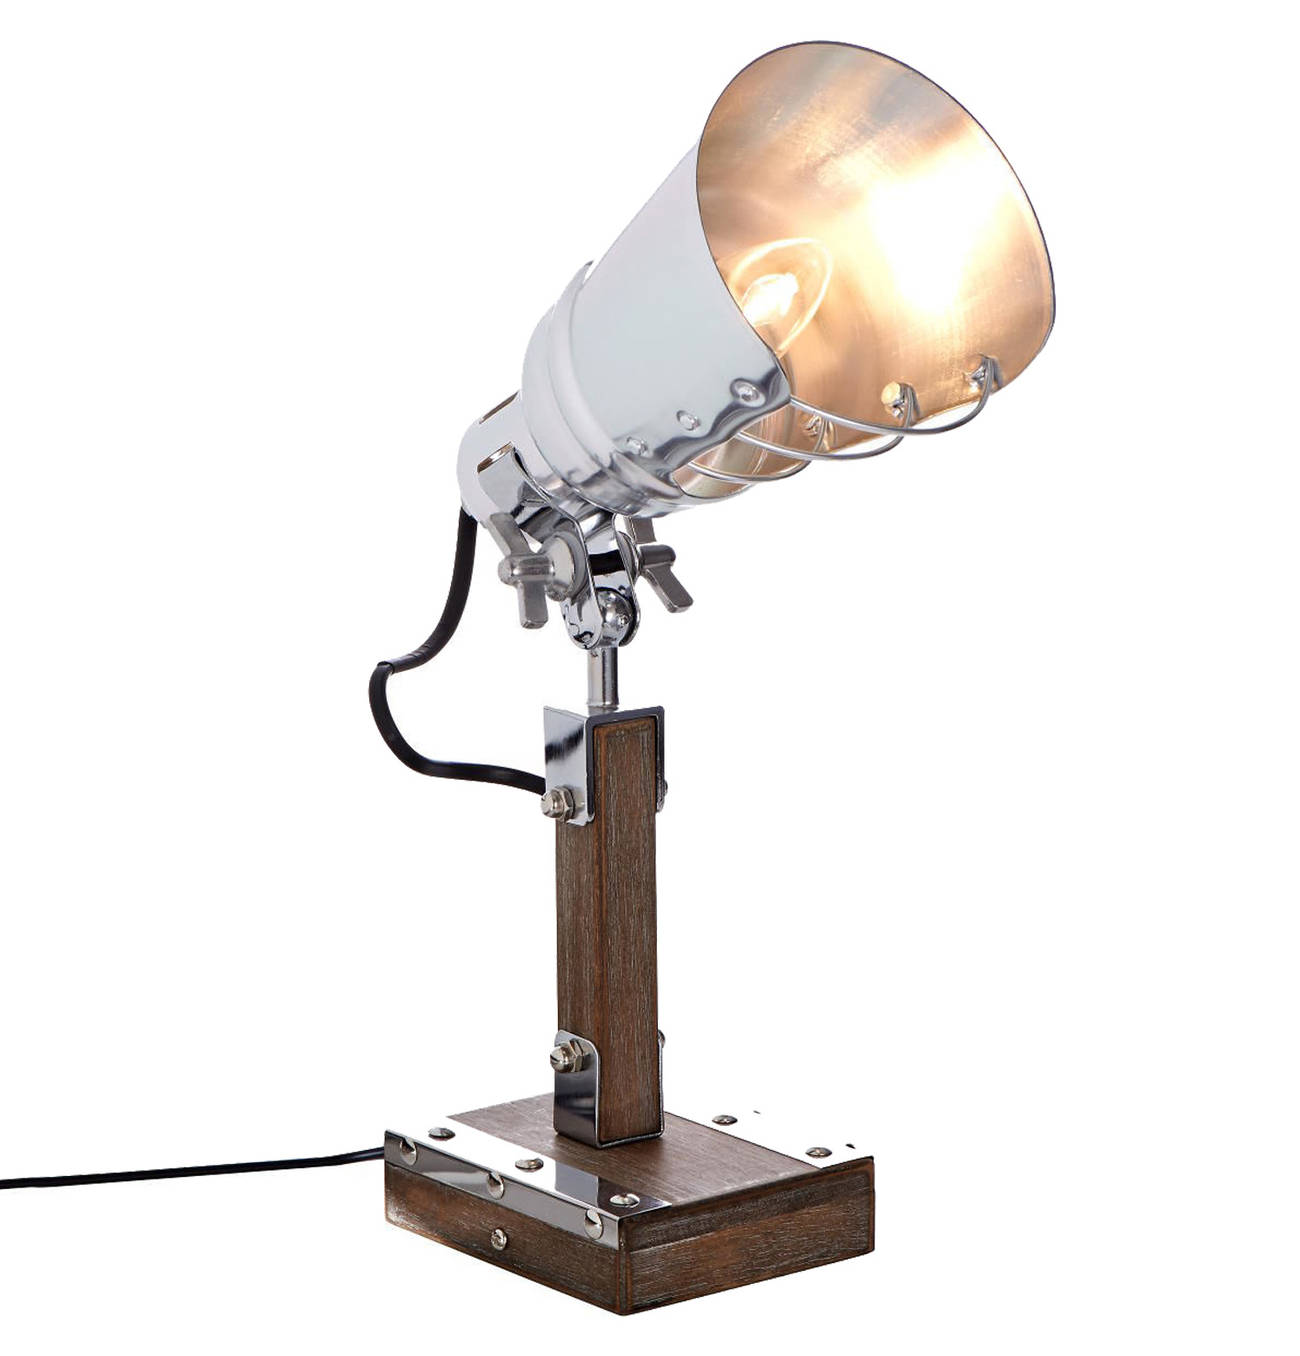 Butlers Spotlight Wandleuchte Wandleuchte Schreibtischlampe Lampen